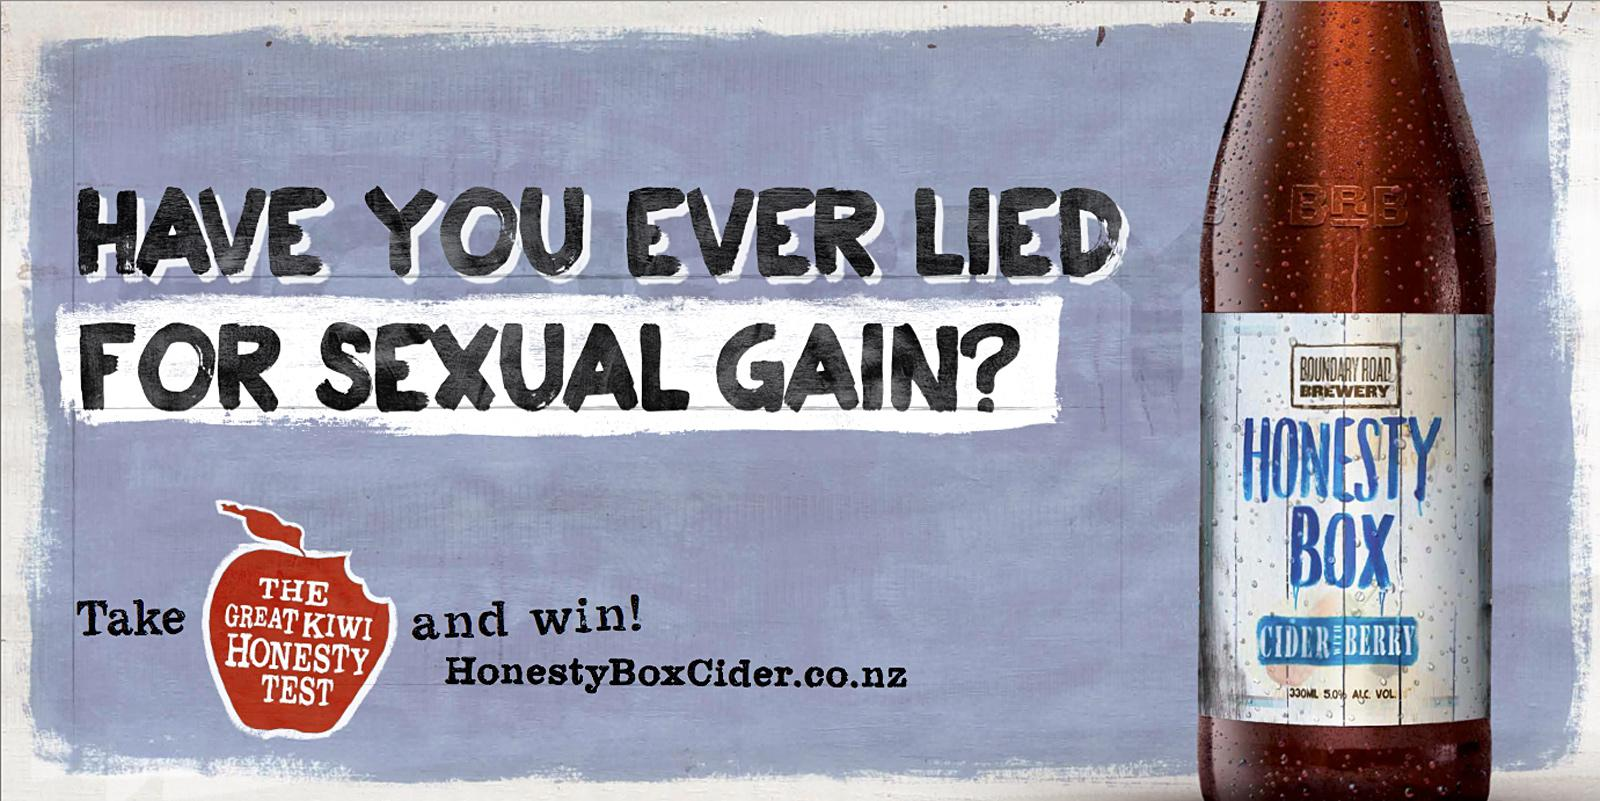 Honesty Box Cider Outdoor Ad -  Sexual Gain